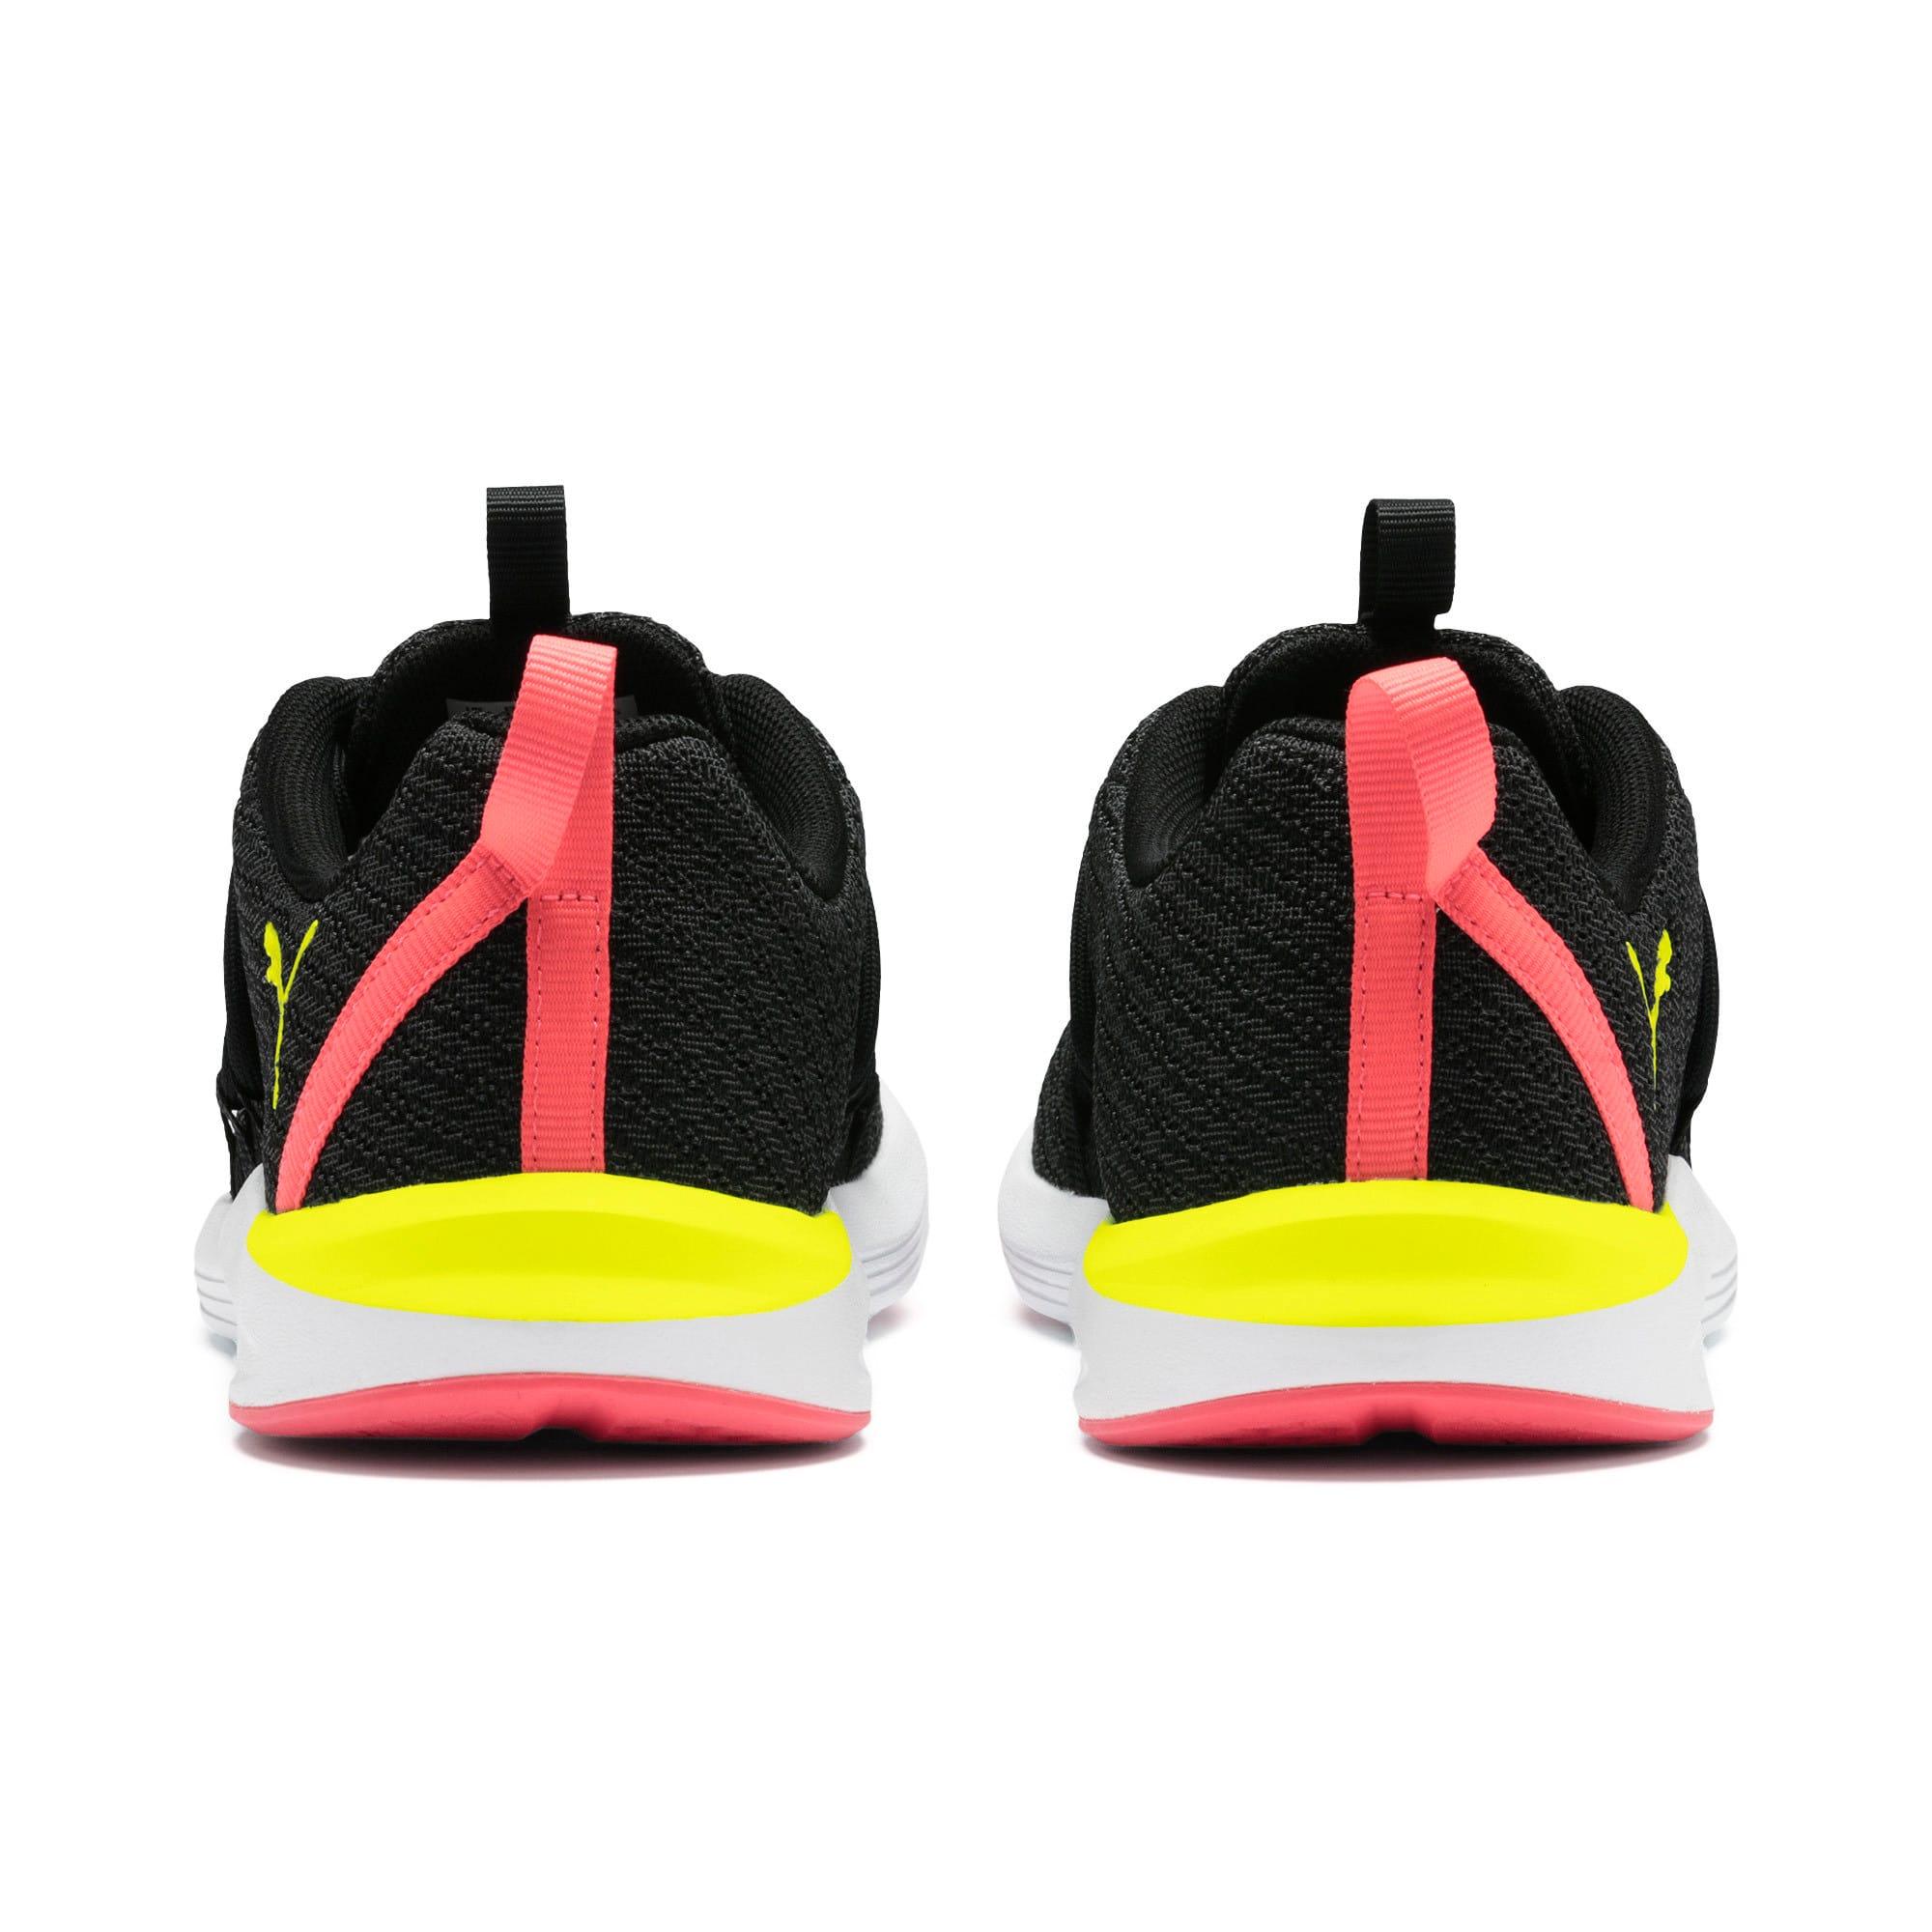 Thumbnail 4 of Prowl Alt Neon Women's Training Shoes, Puma Black-Yellow Alert, medium